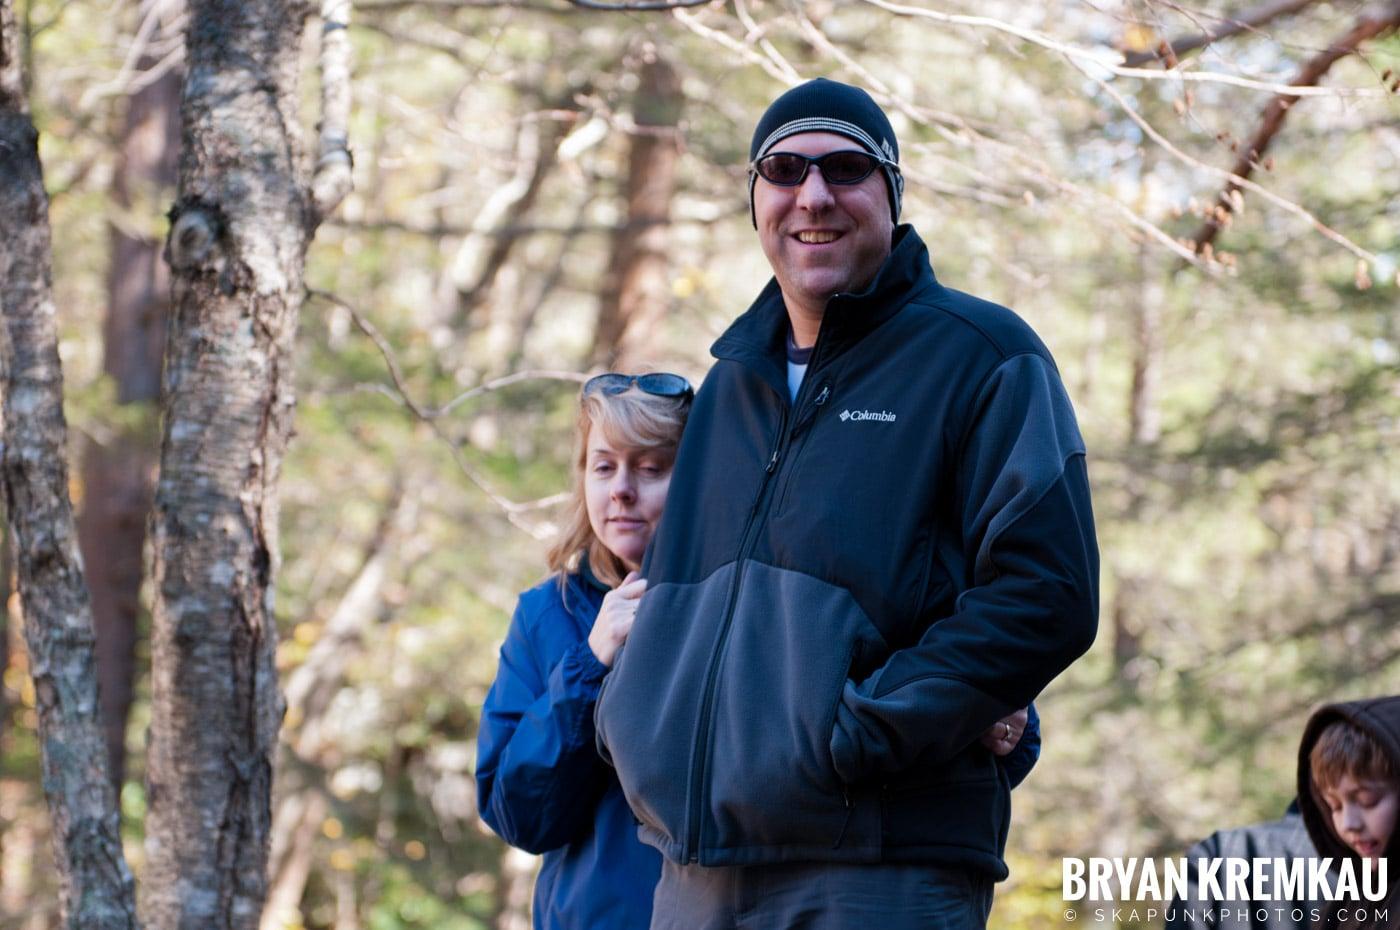 Minnewaska State Park Preserve @ Wawarsing, New York - 10.22.11 (30)